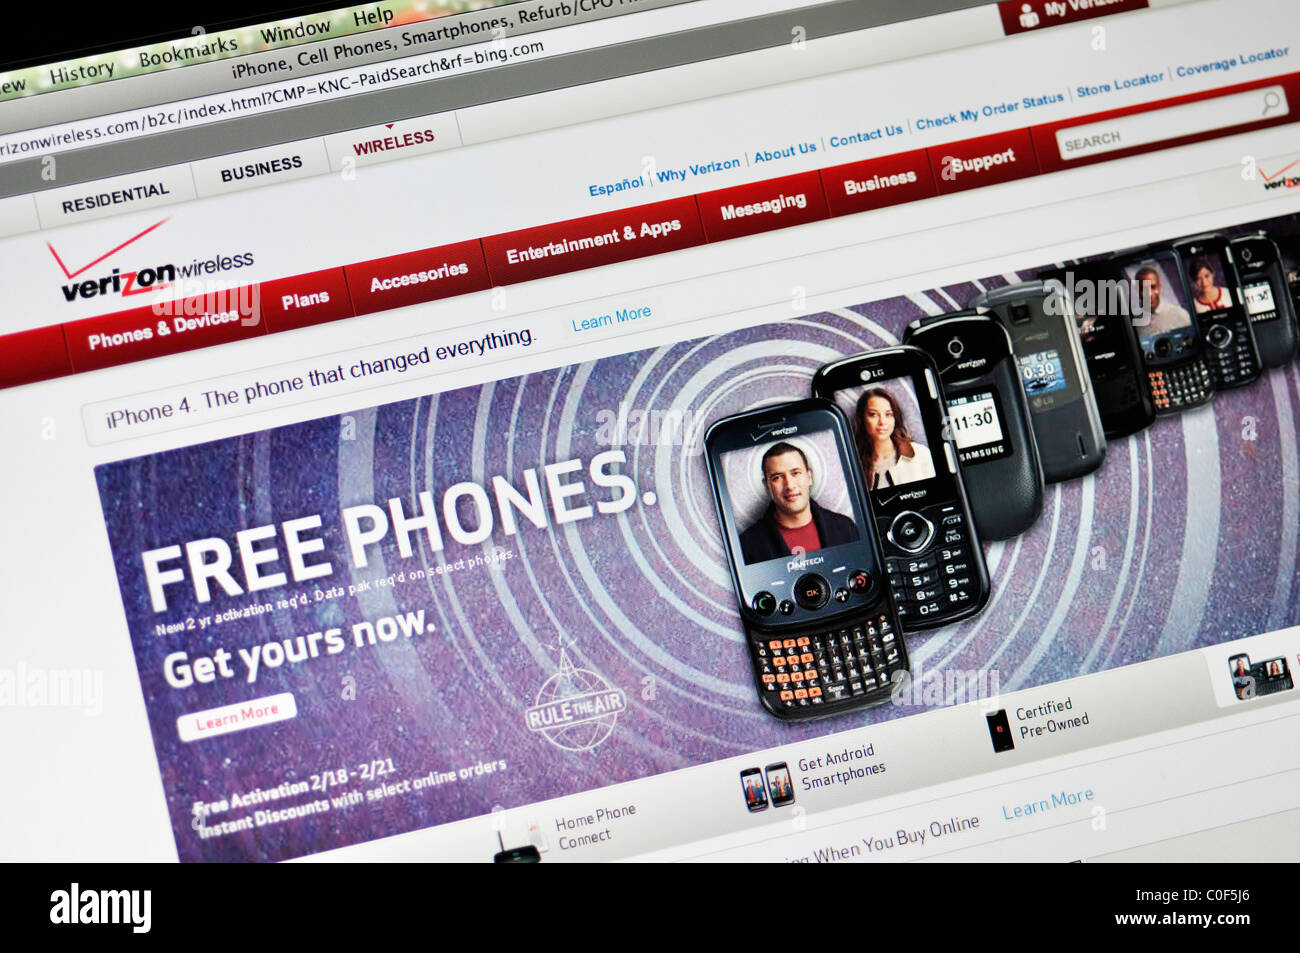 Verizon website Stock Photo: 34754446 - Alamy